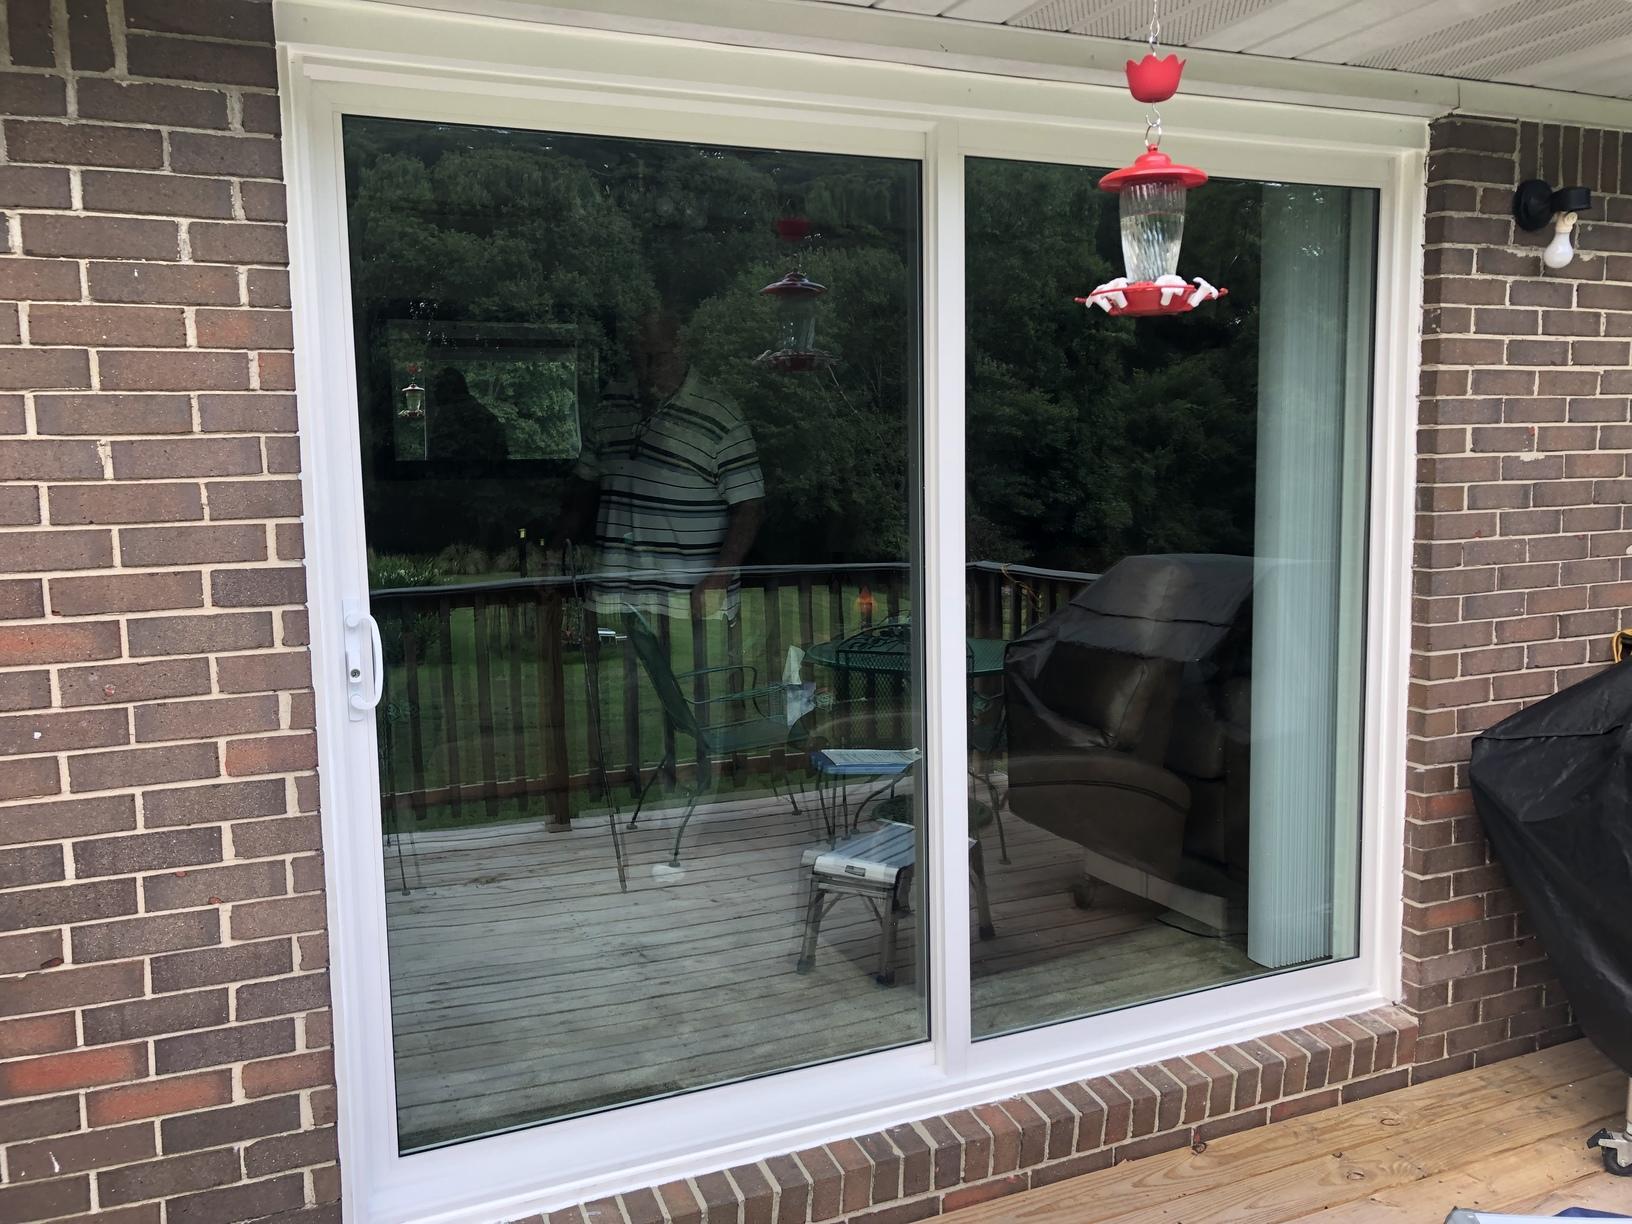 Energy Efficient Sliding Glass Door - After Photo